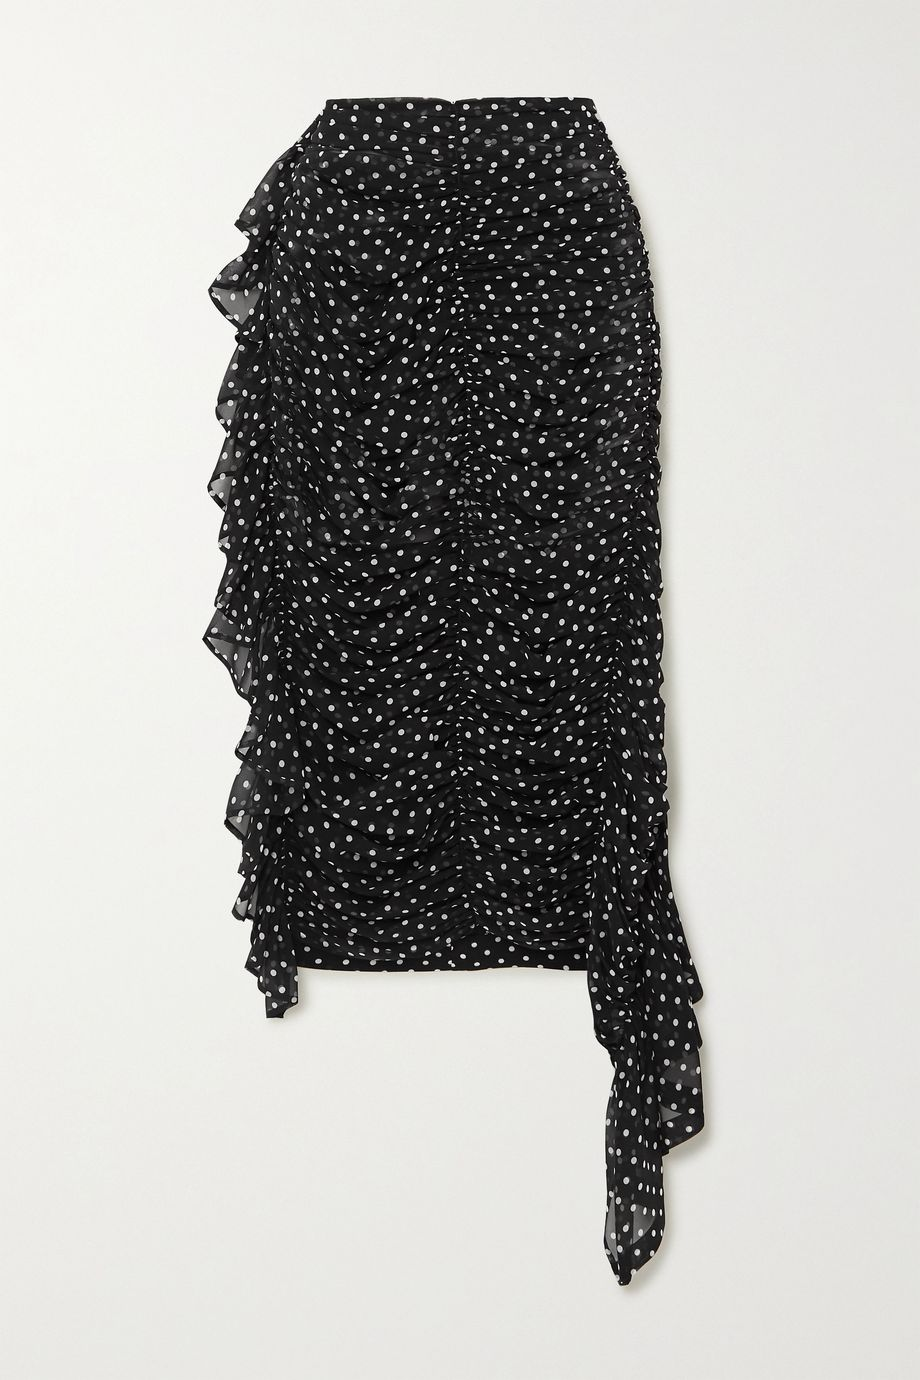 Dries Van Noten Asymmetric ruched polka-dot silk-georgette midi skirt